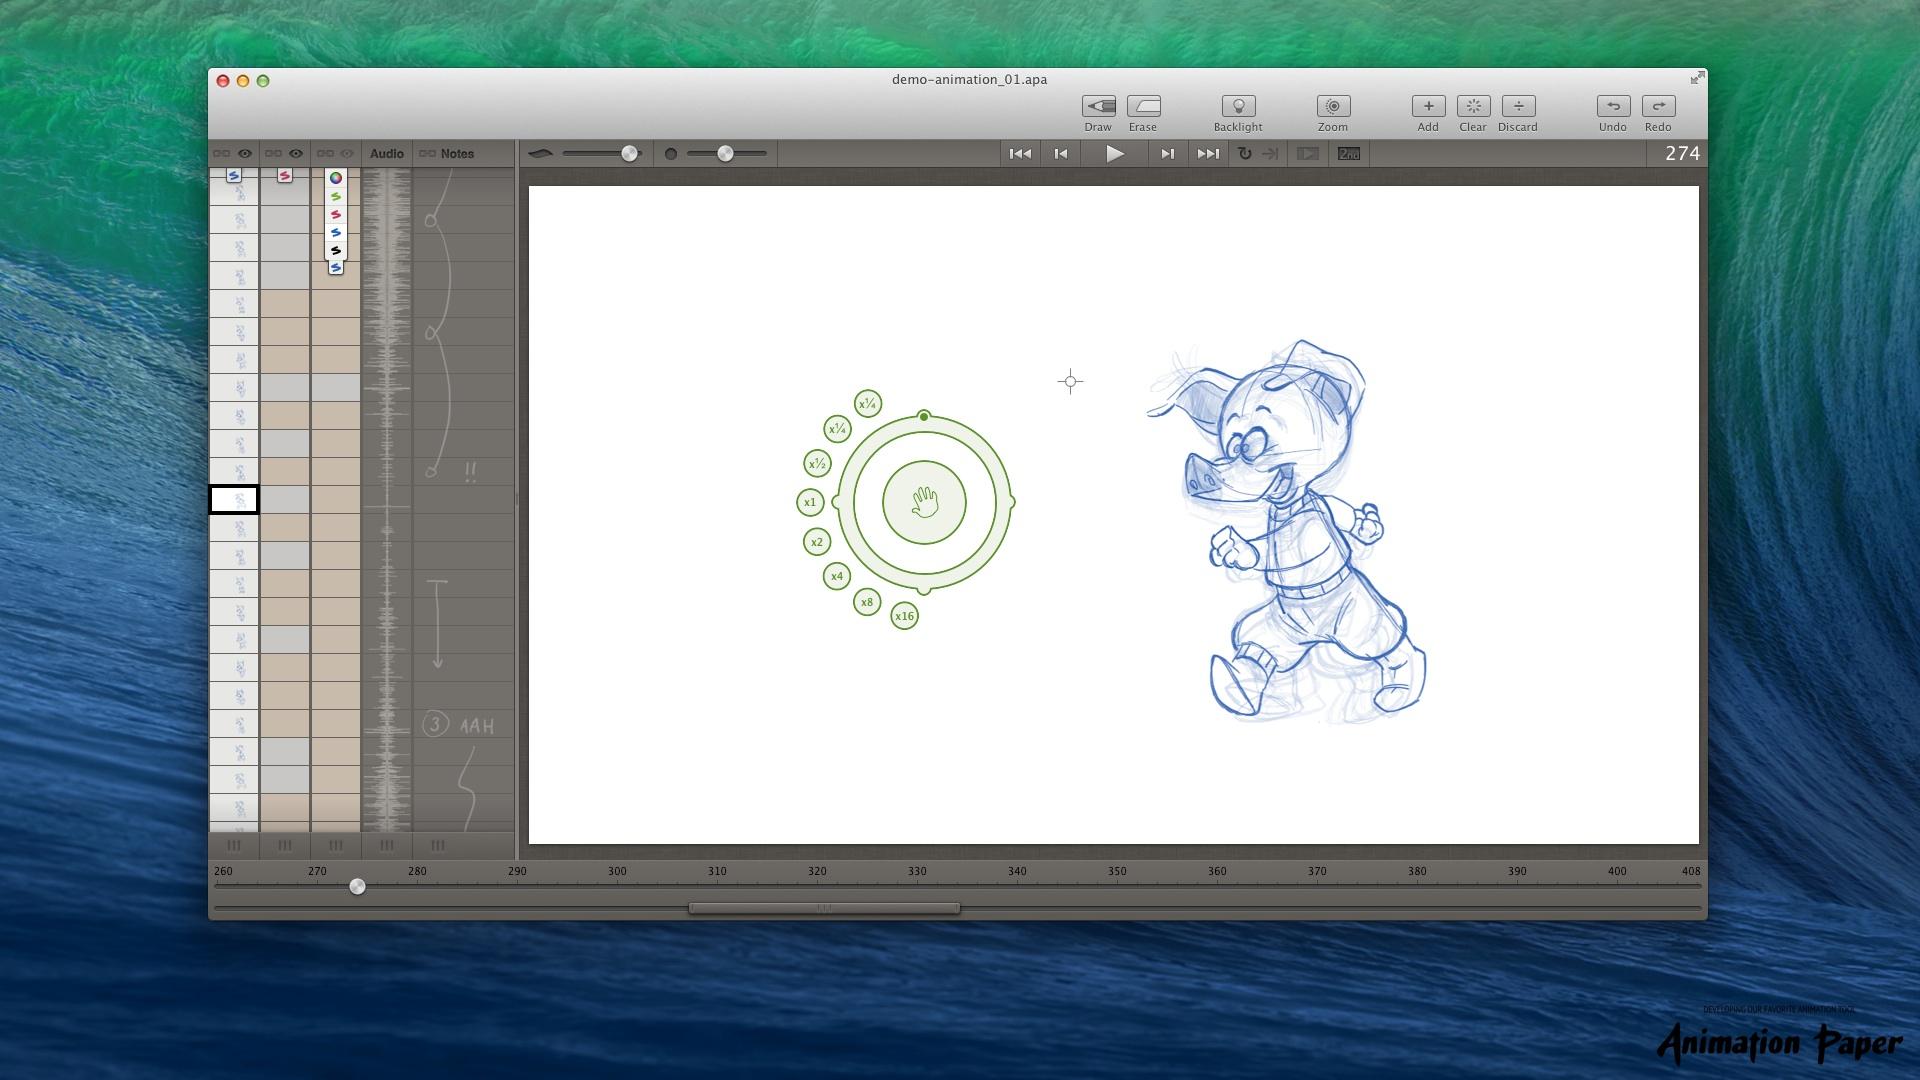 Animation a plenty!